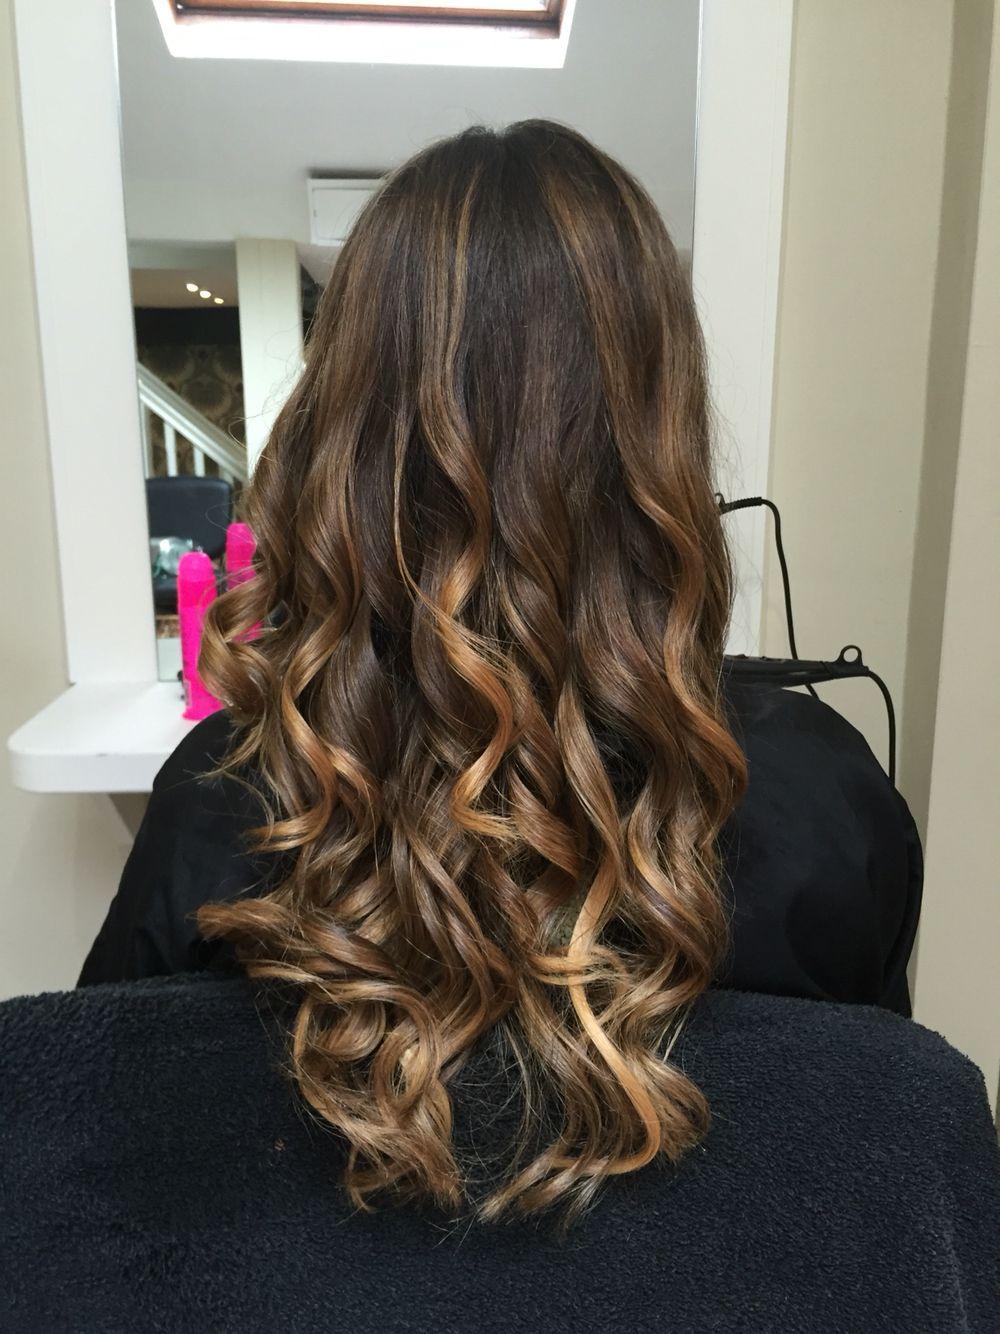 Long brown hair balayage curls hairstyle blonde tones